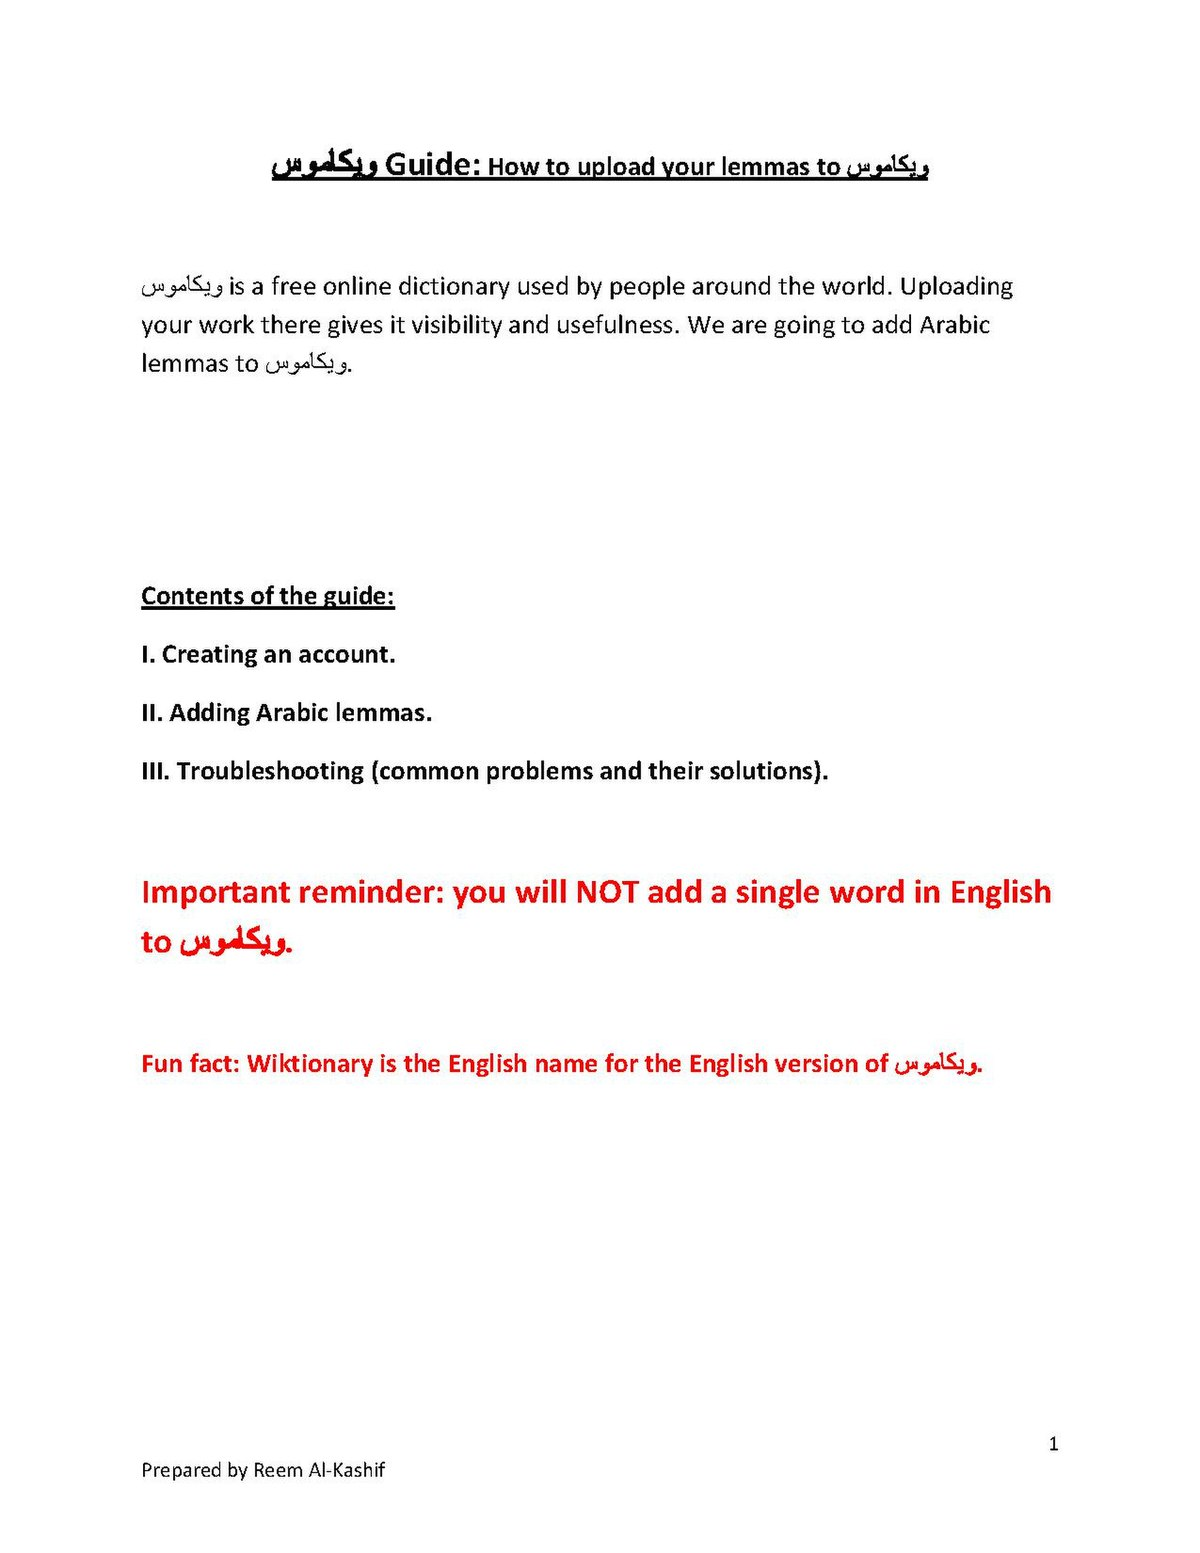 FileArabic Wiktionary Guide.pdf   Wikimedia Commons